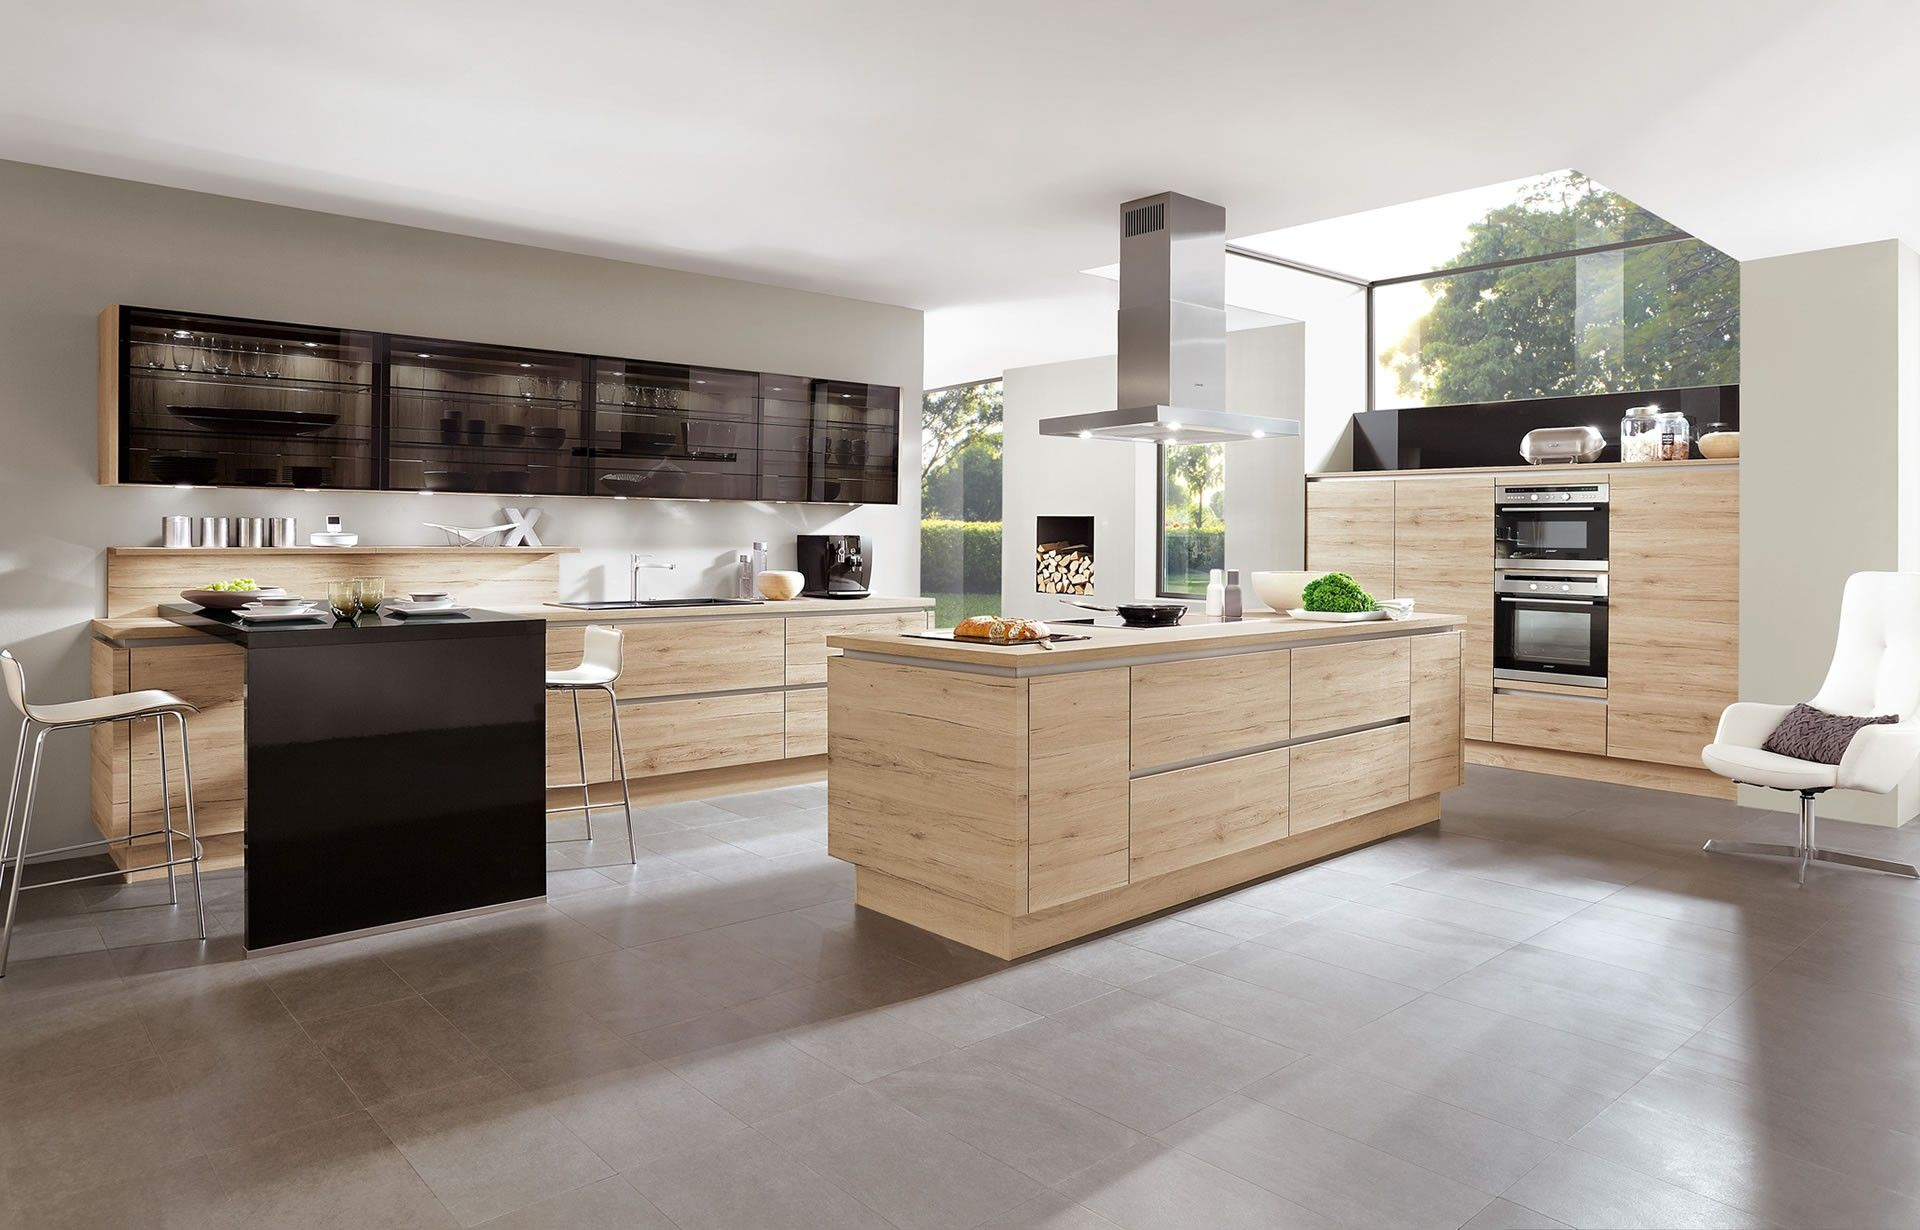 Riva 893 Direct Equipement Interieur De Cuisine Design De Cuisine De Luxe Choses De Cuisine